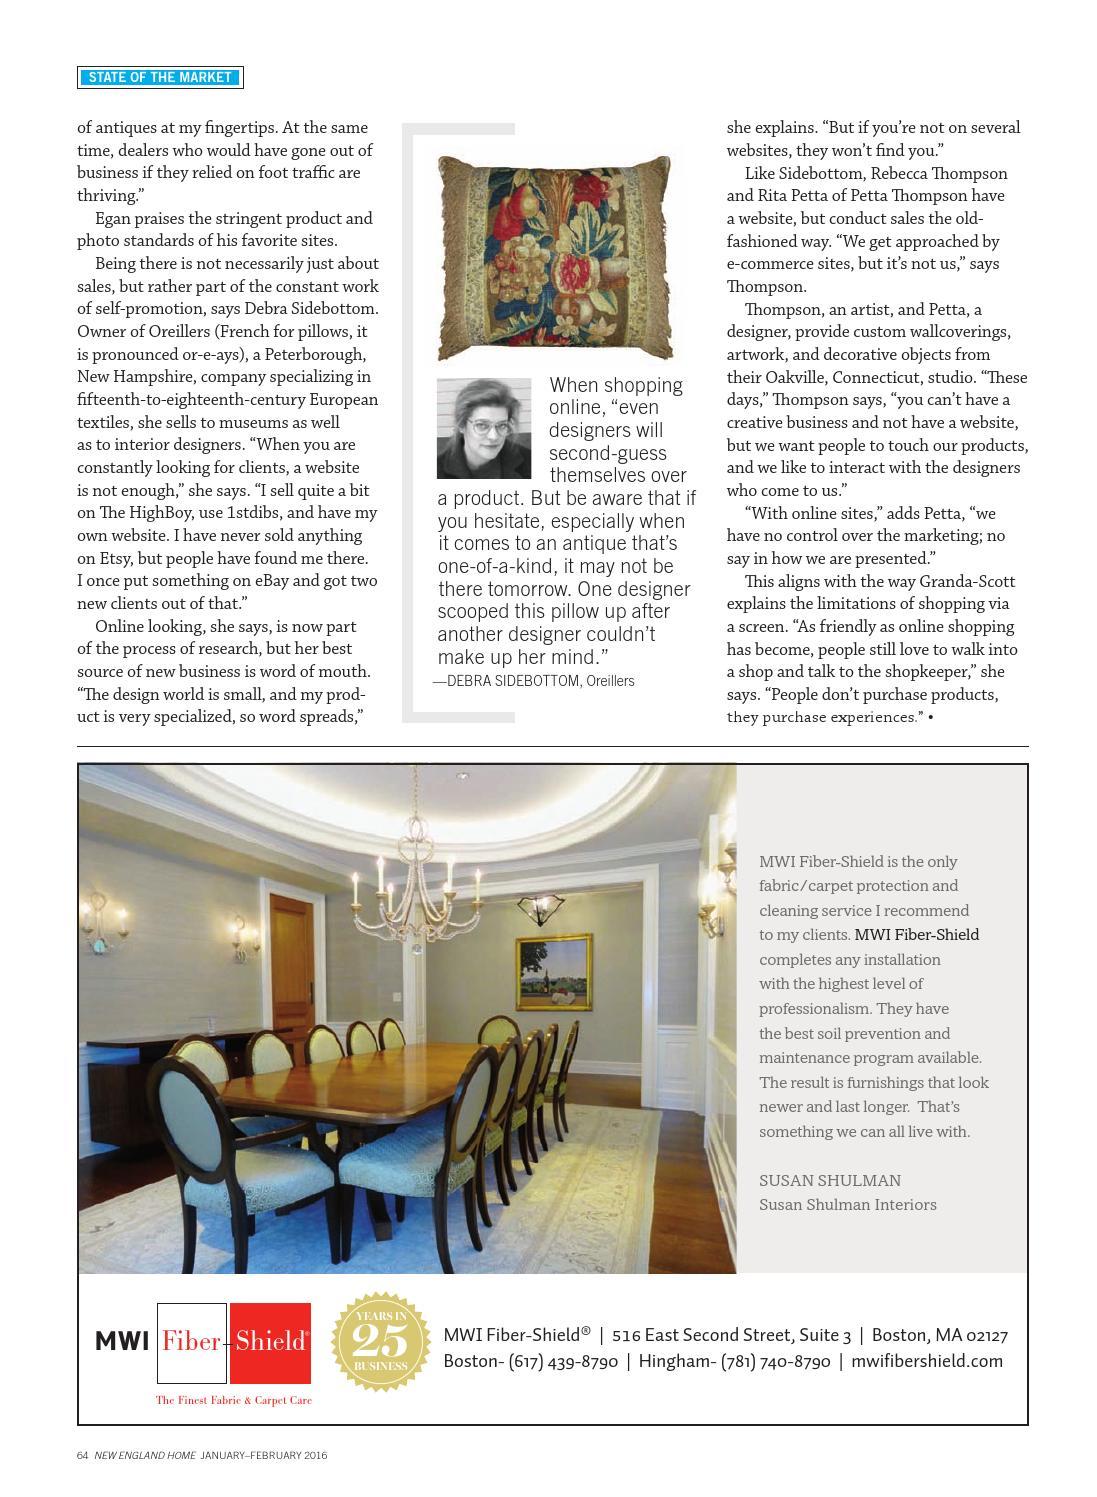 New England Home Jan/Feb 2016 by New England Home Magazine